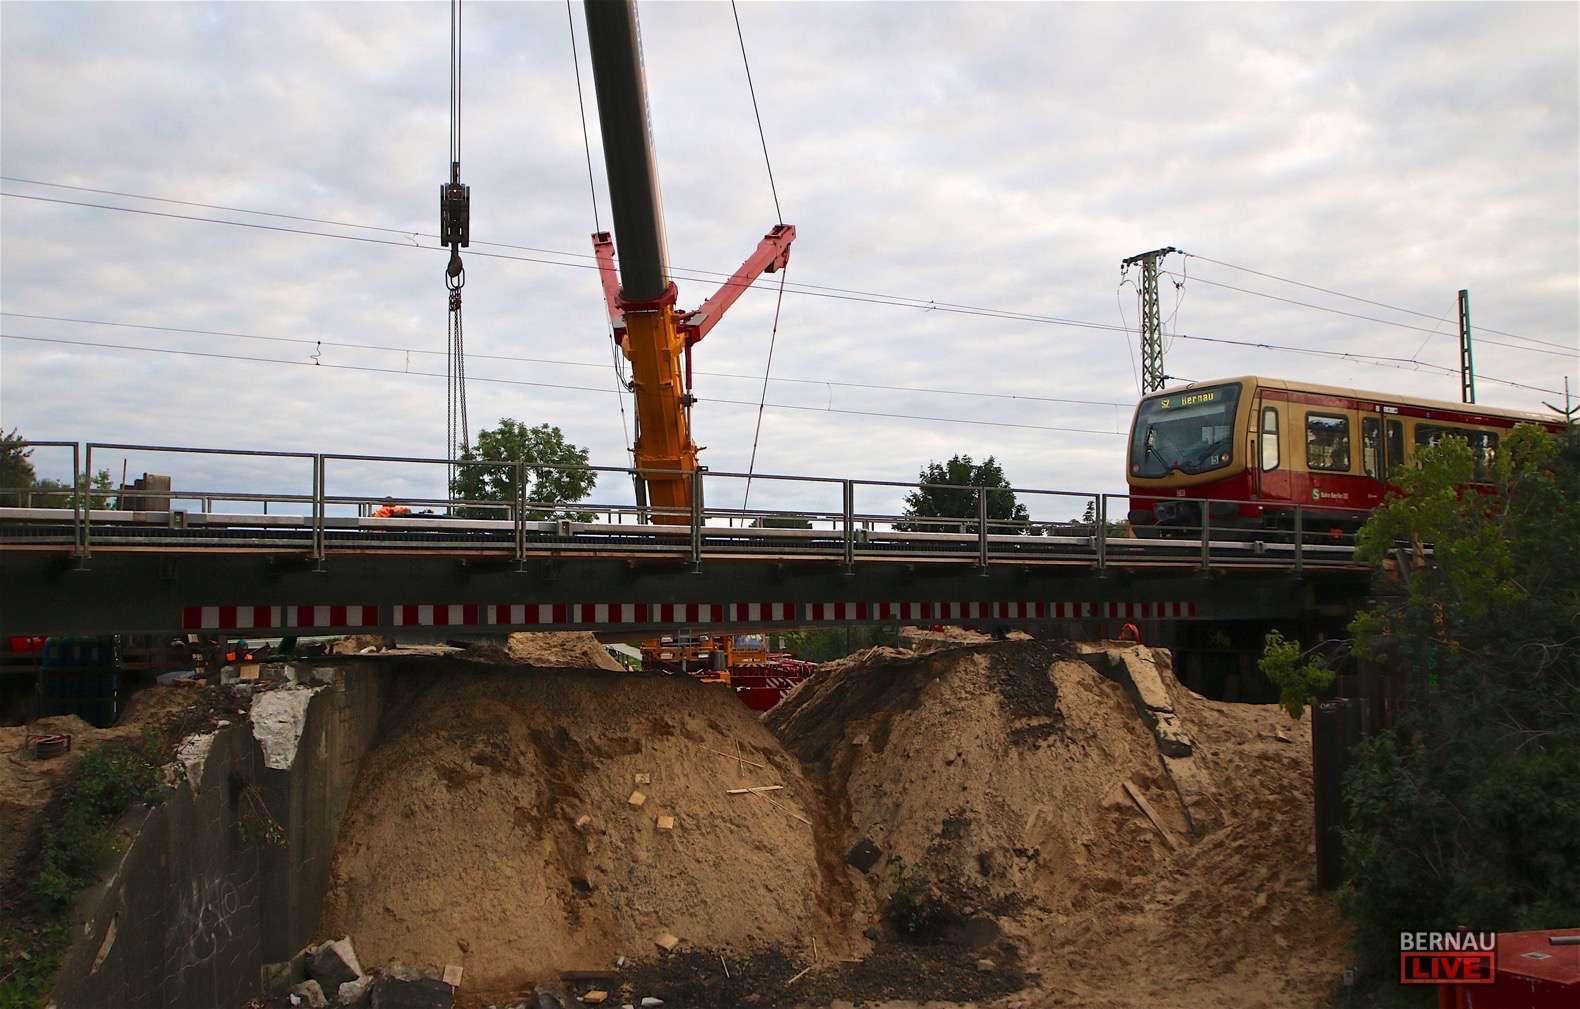 IMG 3708 Bauarbeiten Bahn Bernau